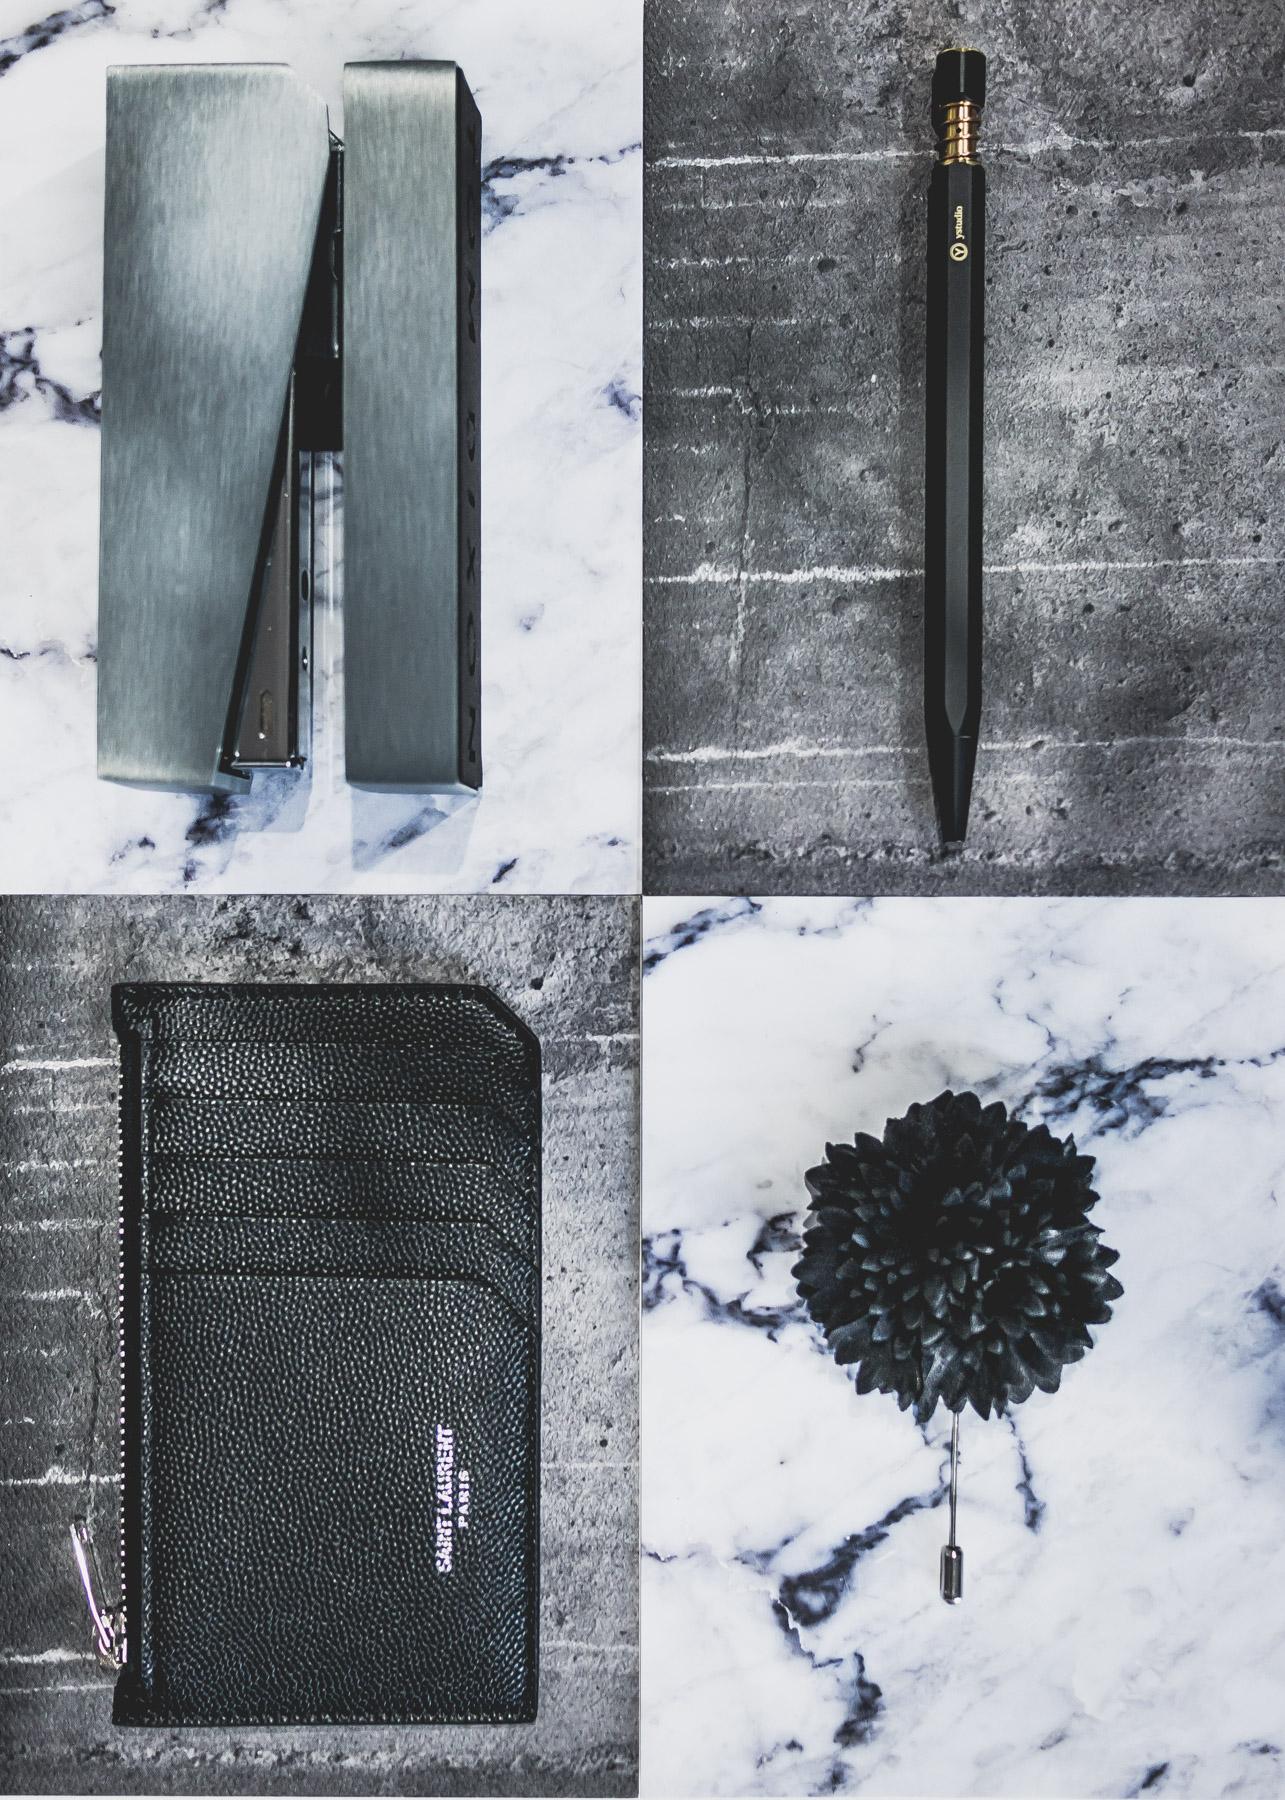 The perfect stocking stuffers:   Tom Dixon Brushed Silver Cube Stapler  ,   YStudio Brass Ballpoint Pen  ,  Saint Laurent Pebble-Grain Leather Cardholder  ,   Lanvin Woven Flower Lapel Pin